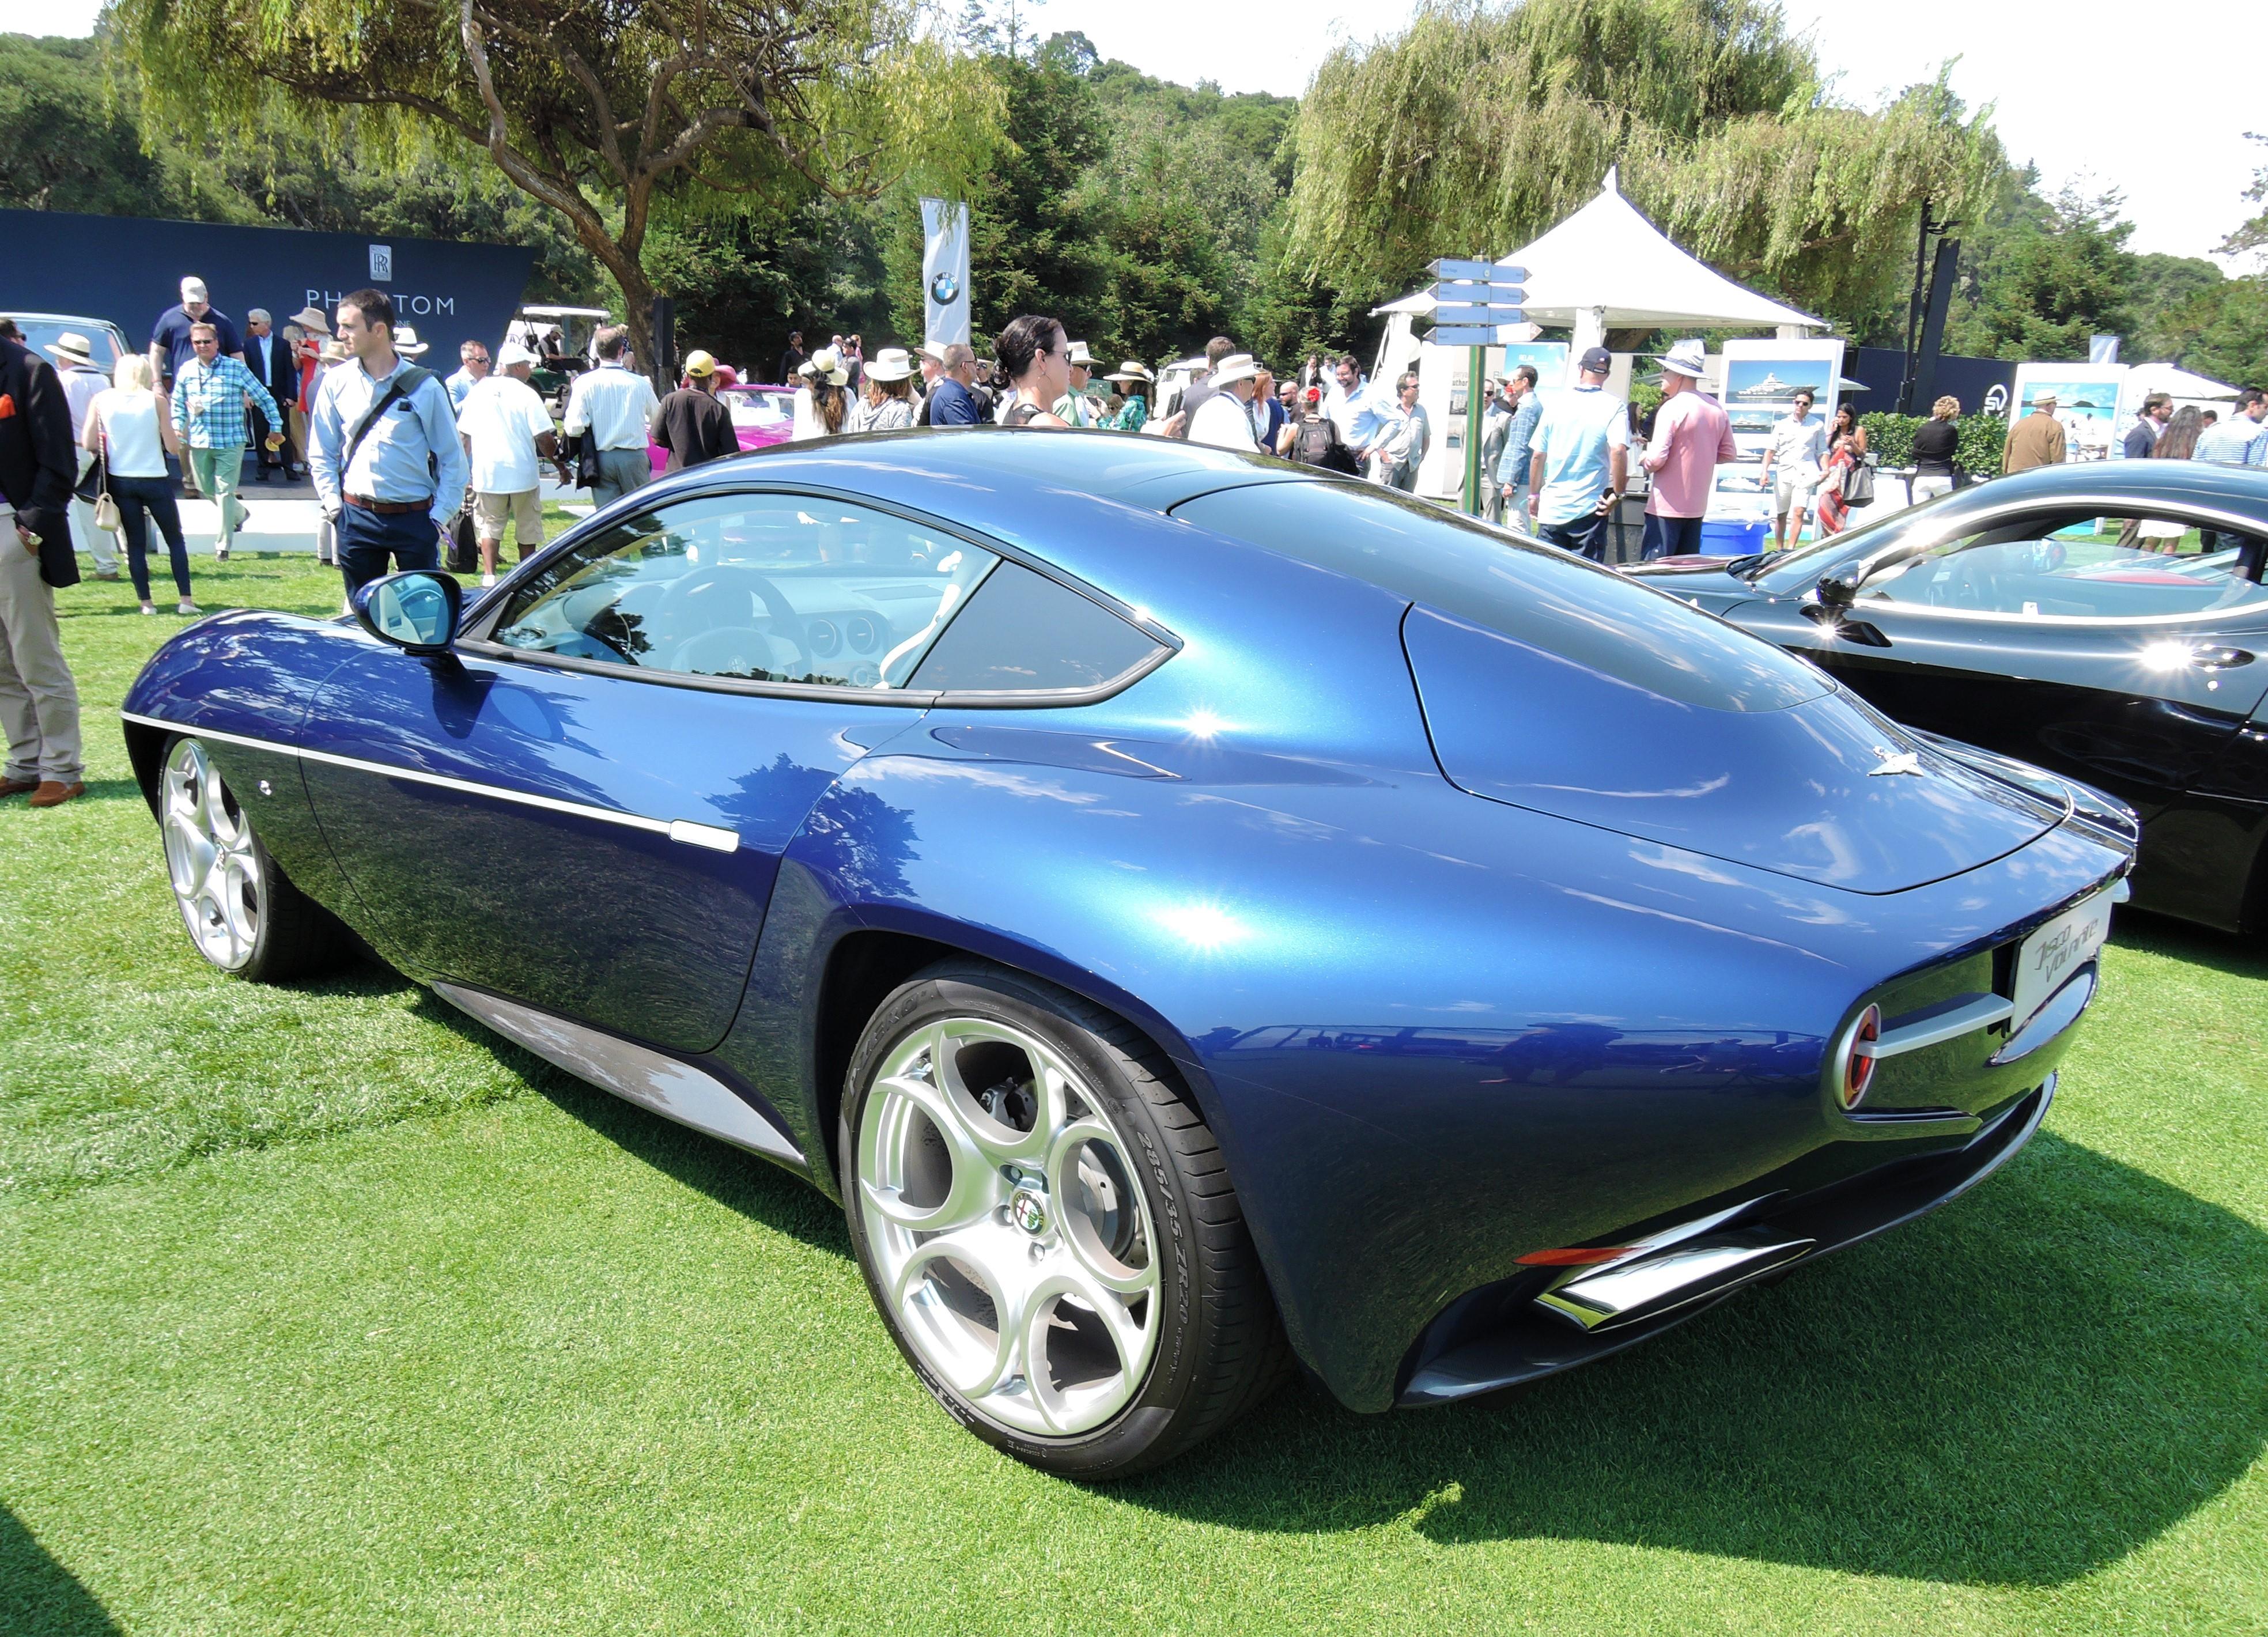 blue 2009 Alfa Romeo Disco Volante - The Quail 2017